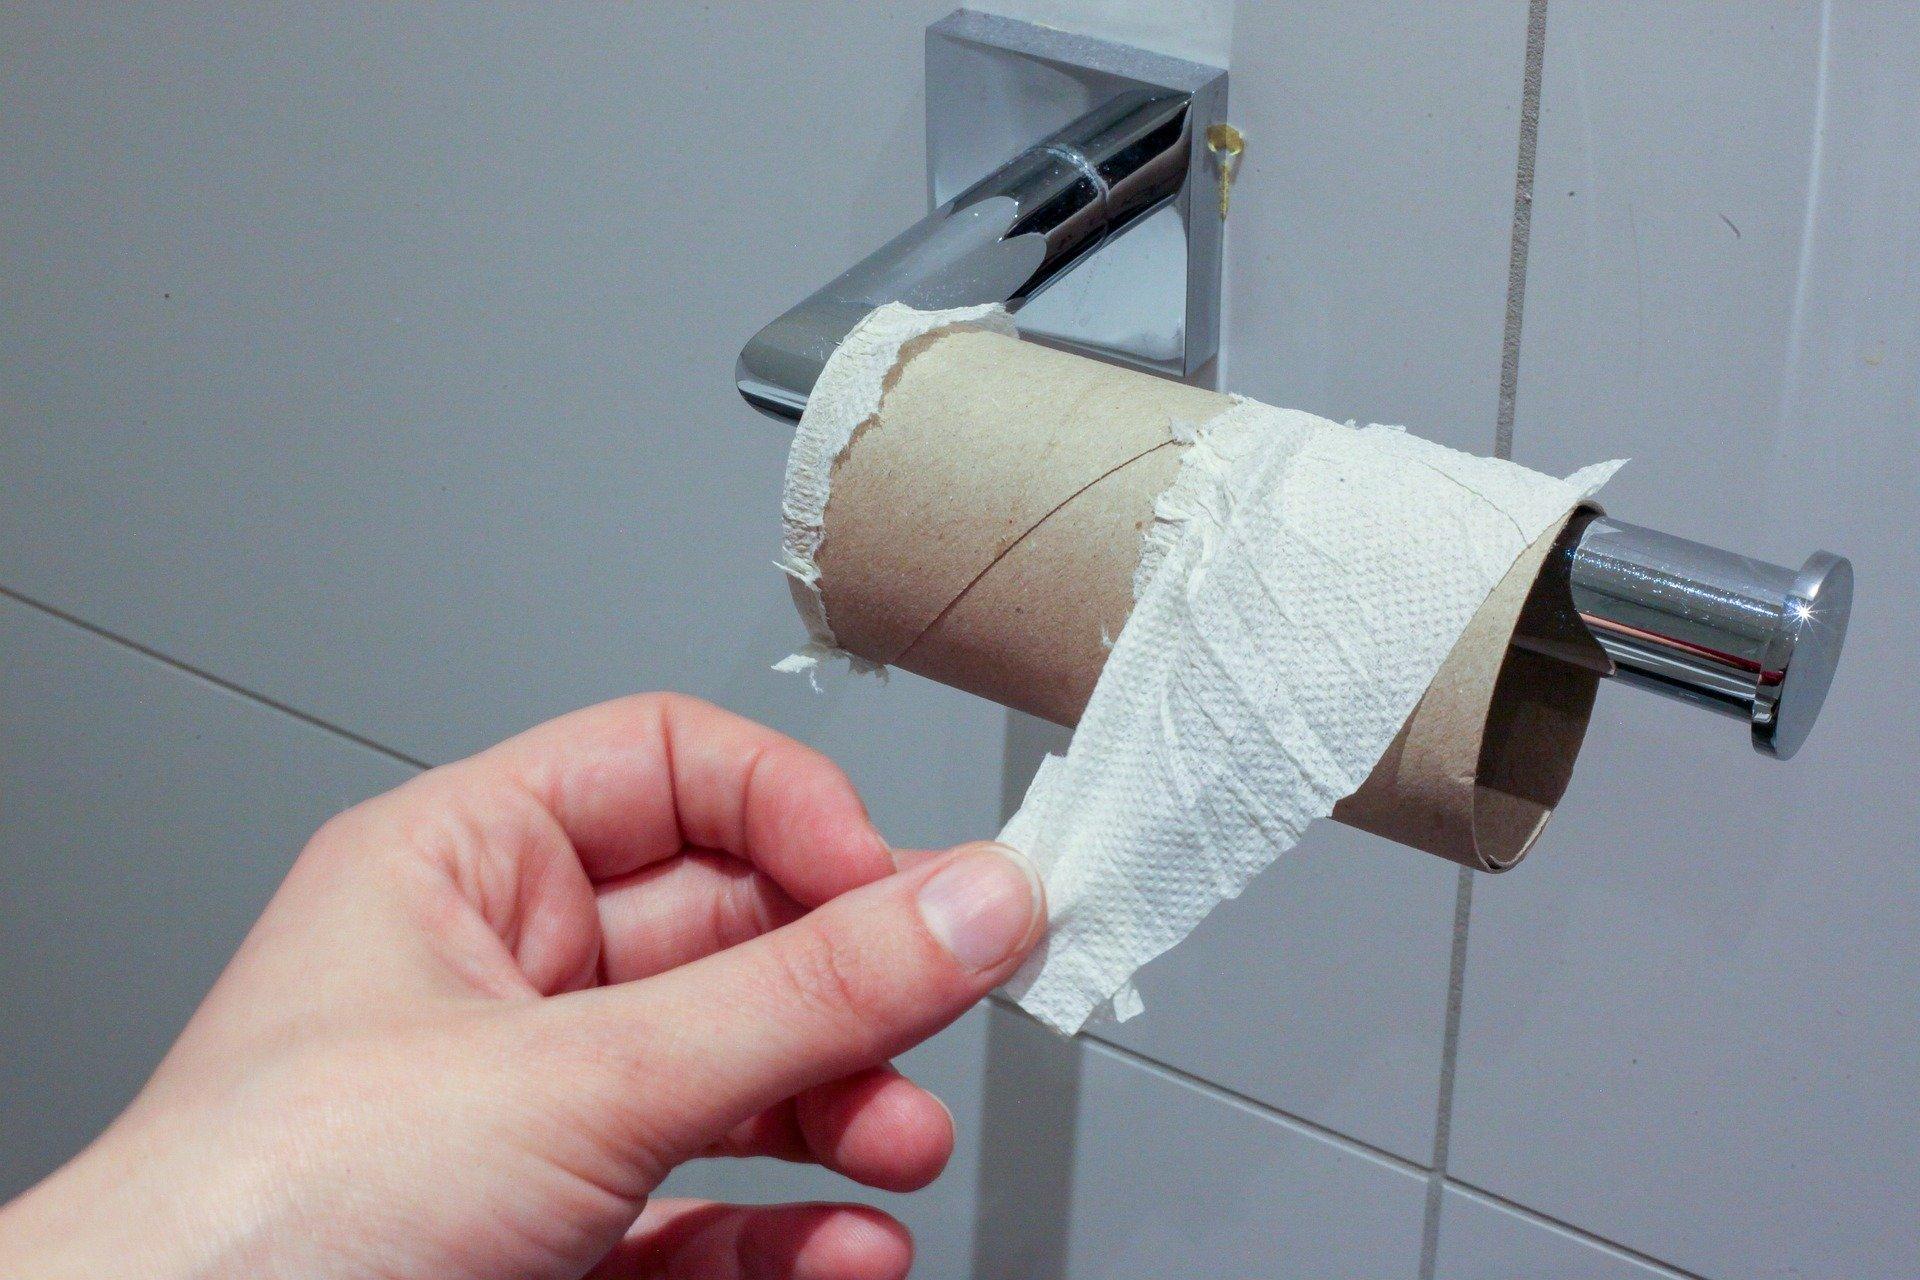 toilet-paper-4941765_1920